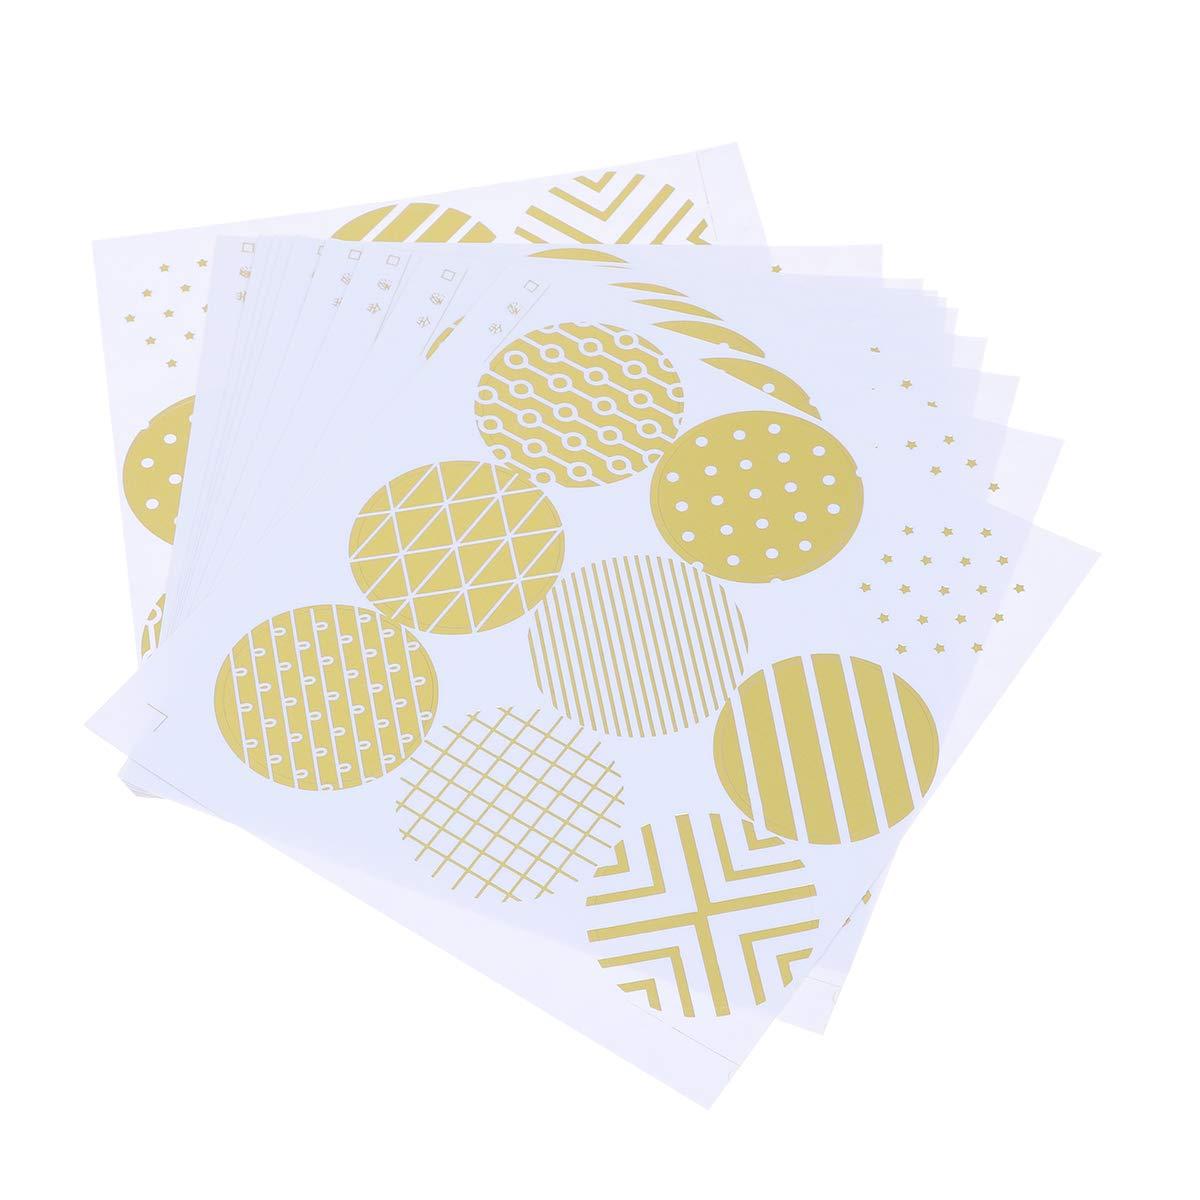 90PCS Gold Sealing Sticker Cookie Egg Cake Adhesive Sticker Candy Box Decorative